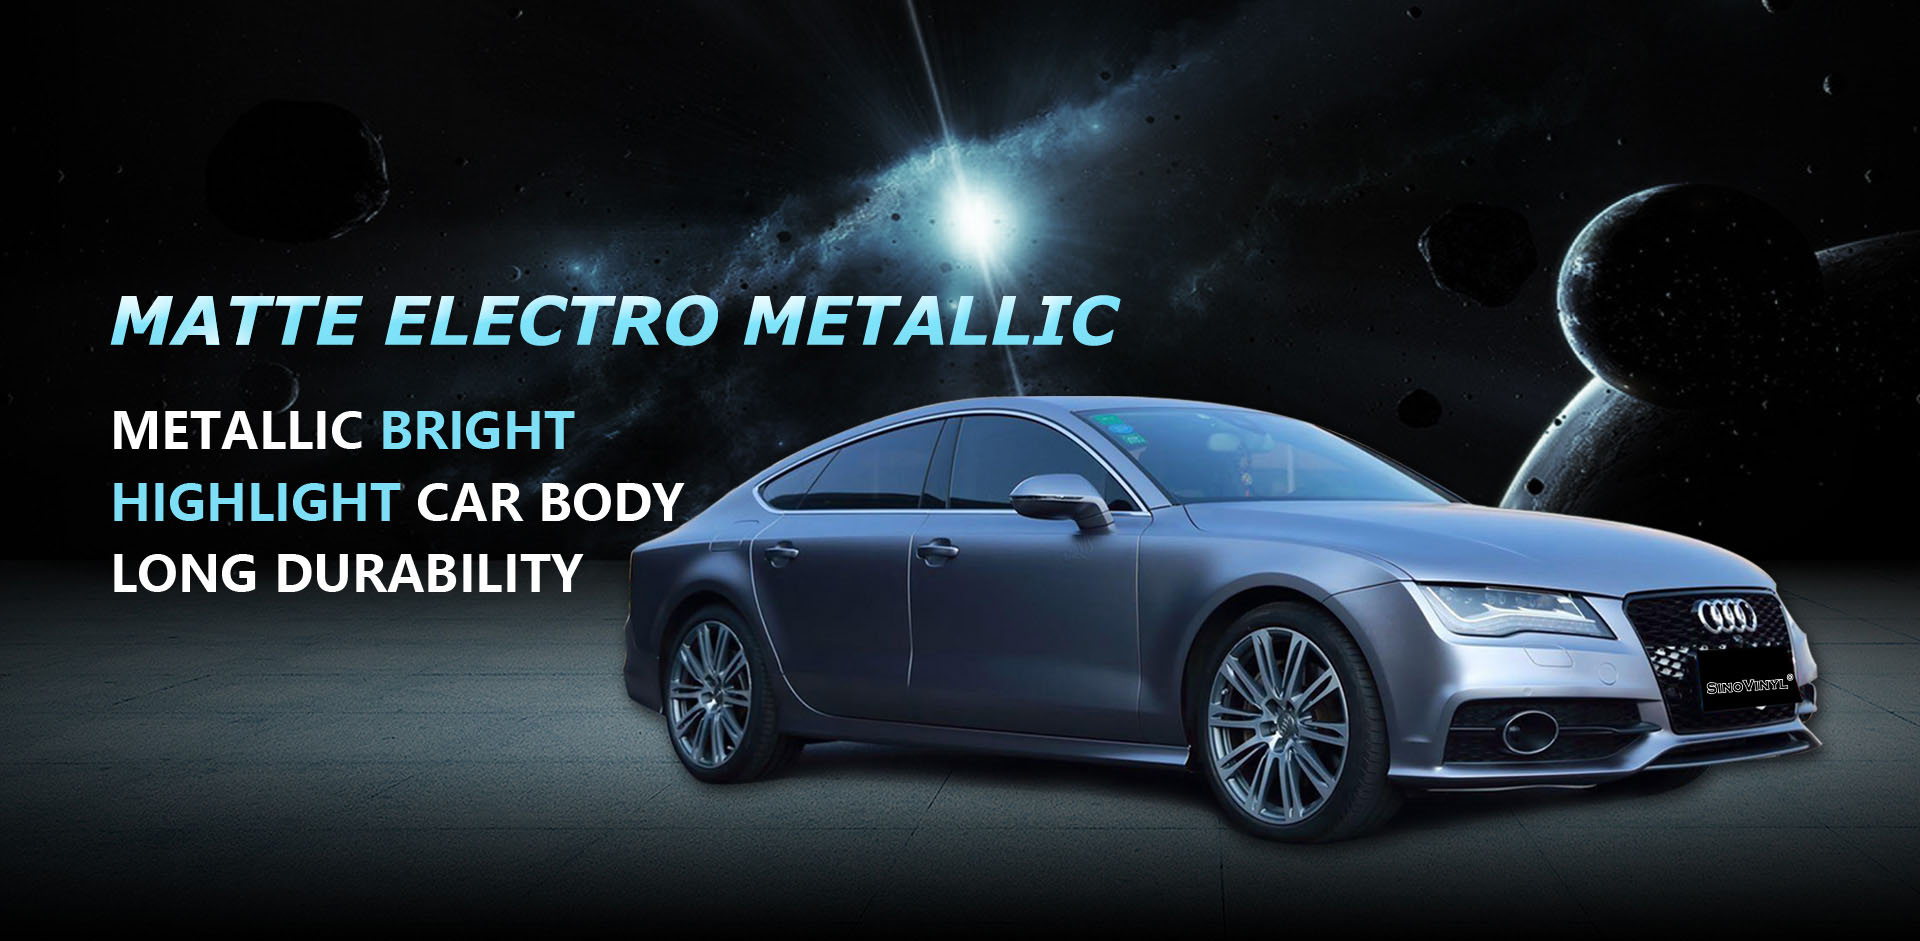 CARLIKE CL-EM Matte Electro Metallic Vinyl Car Wrap